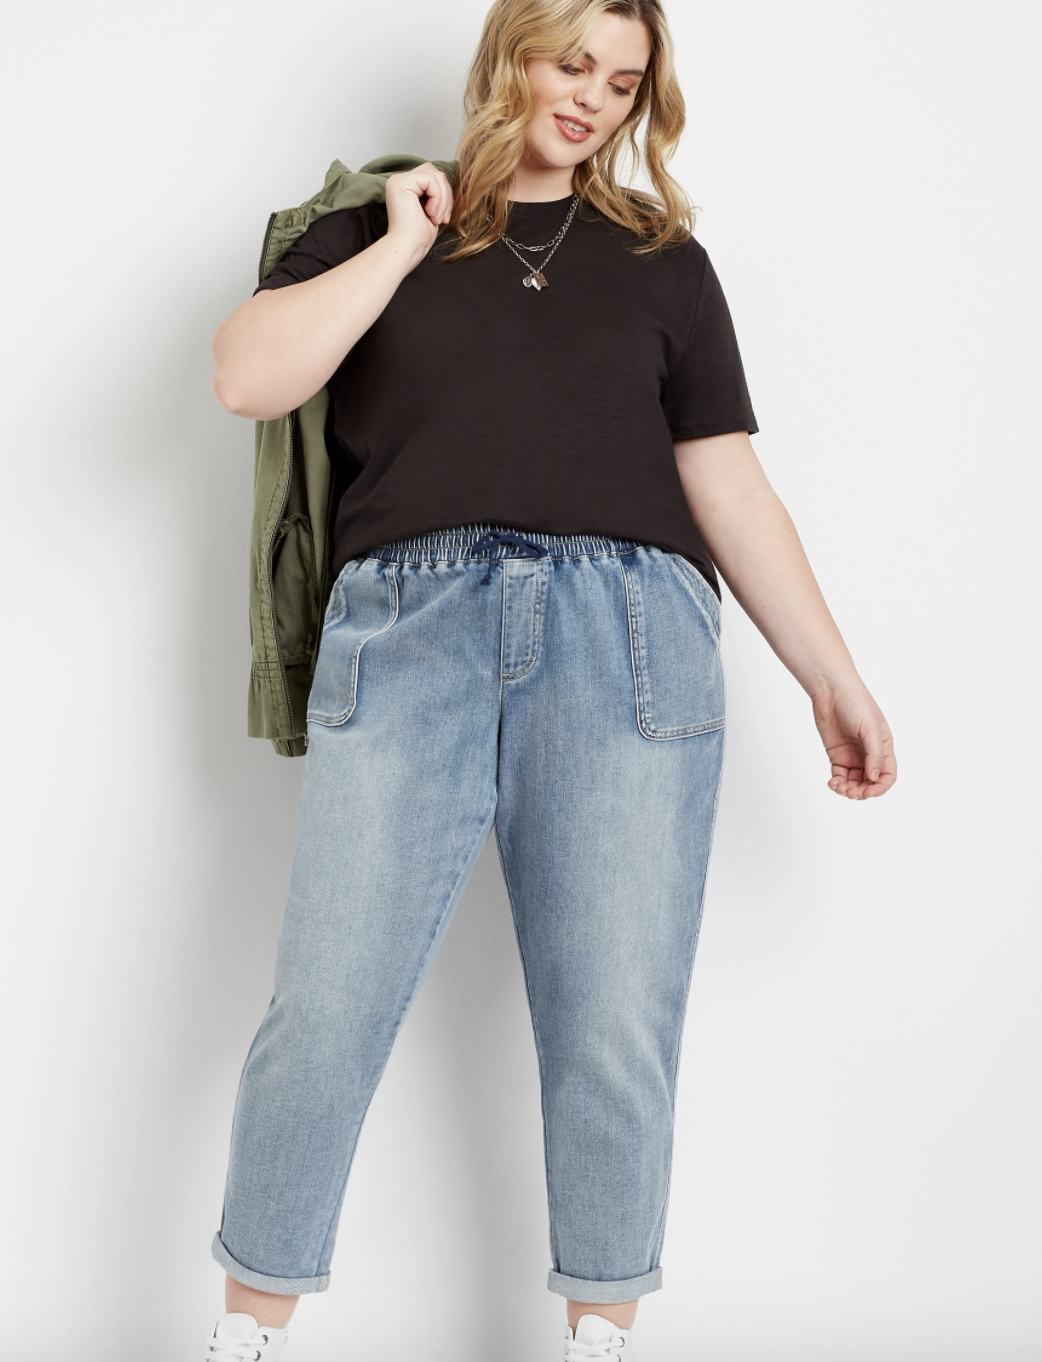 a plus size model wearing the medium marble wash weekender pants